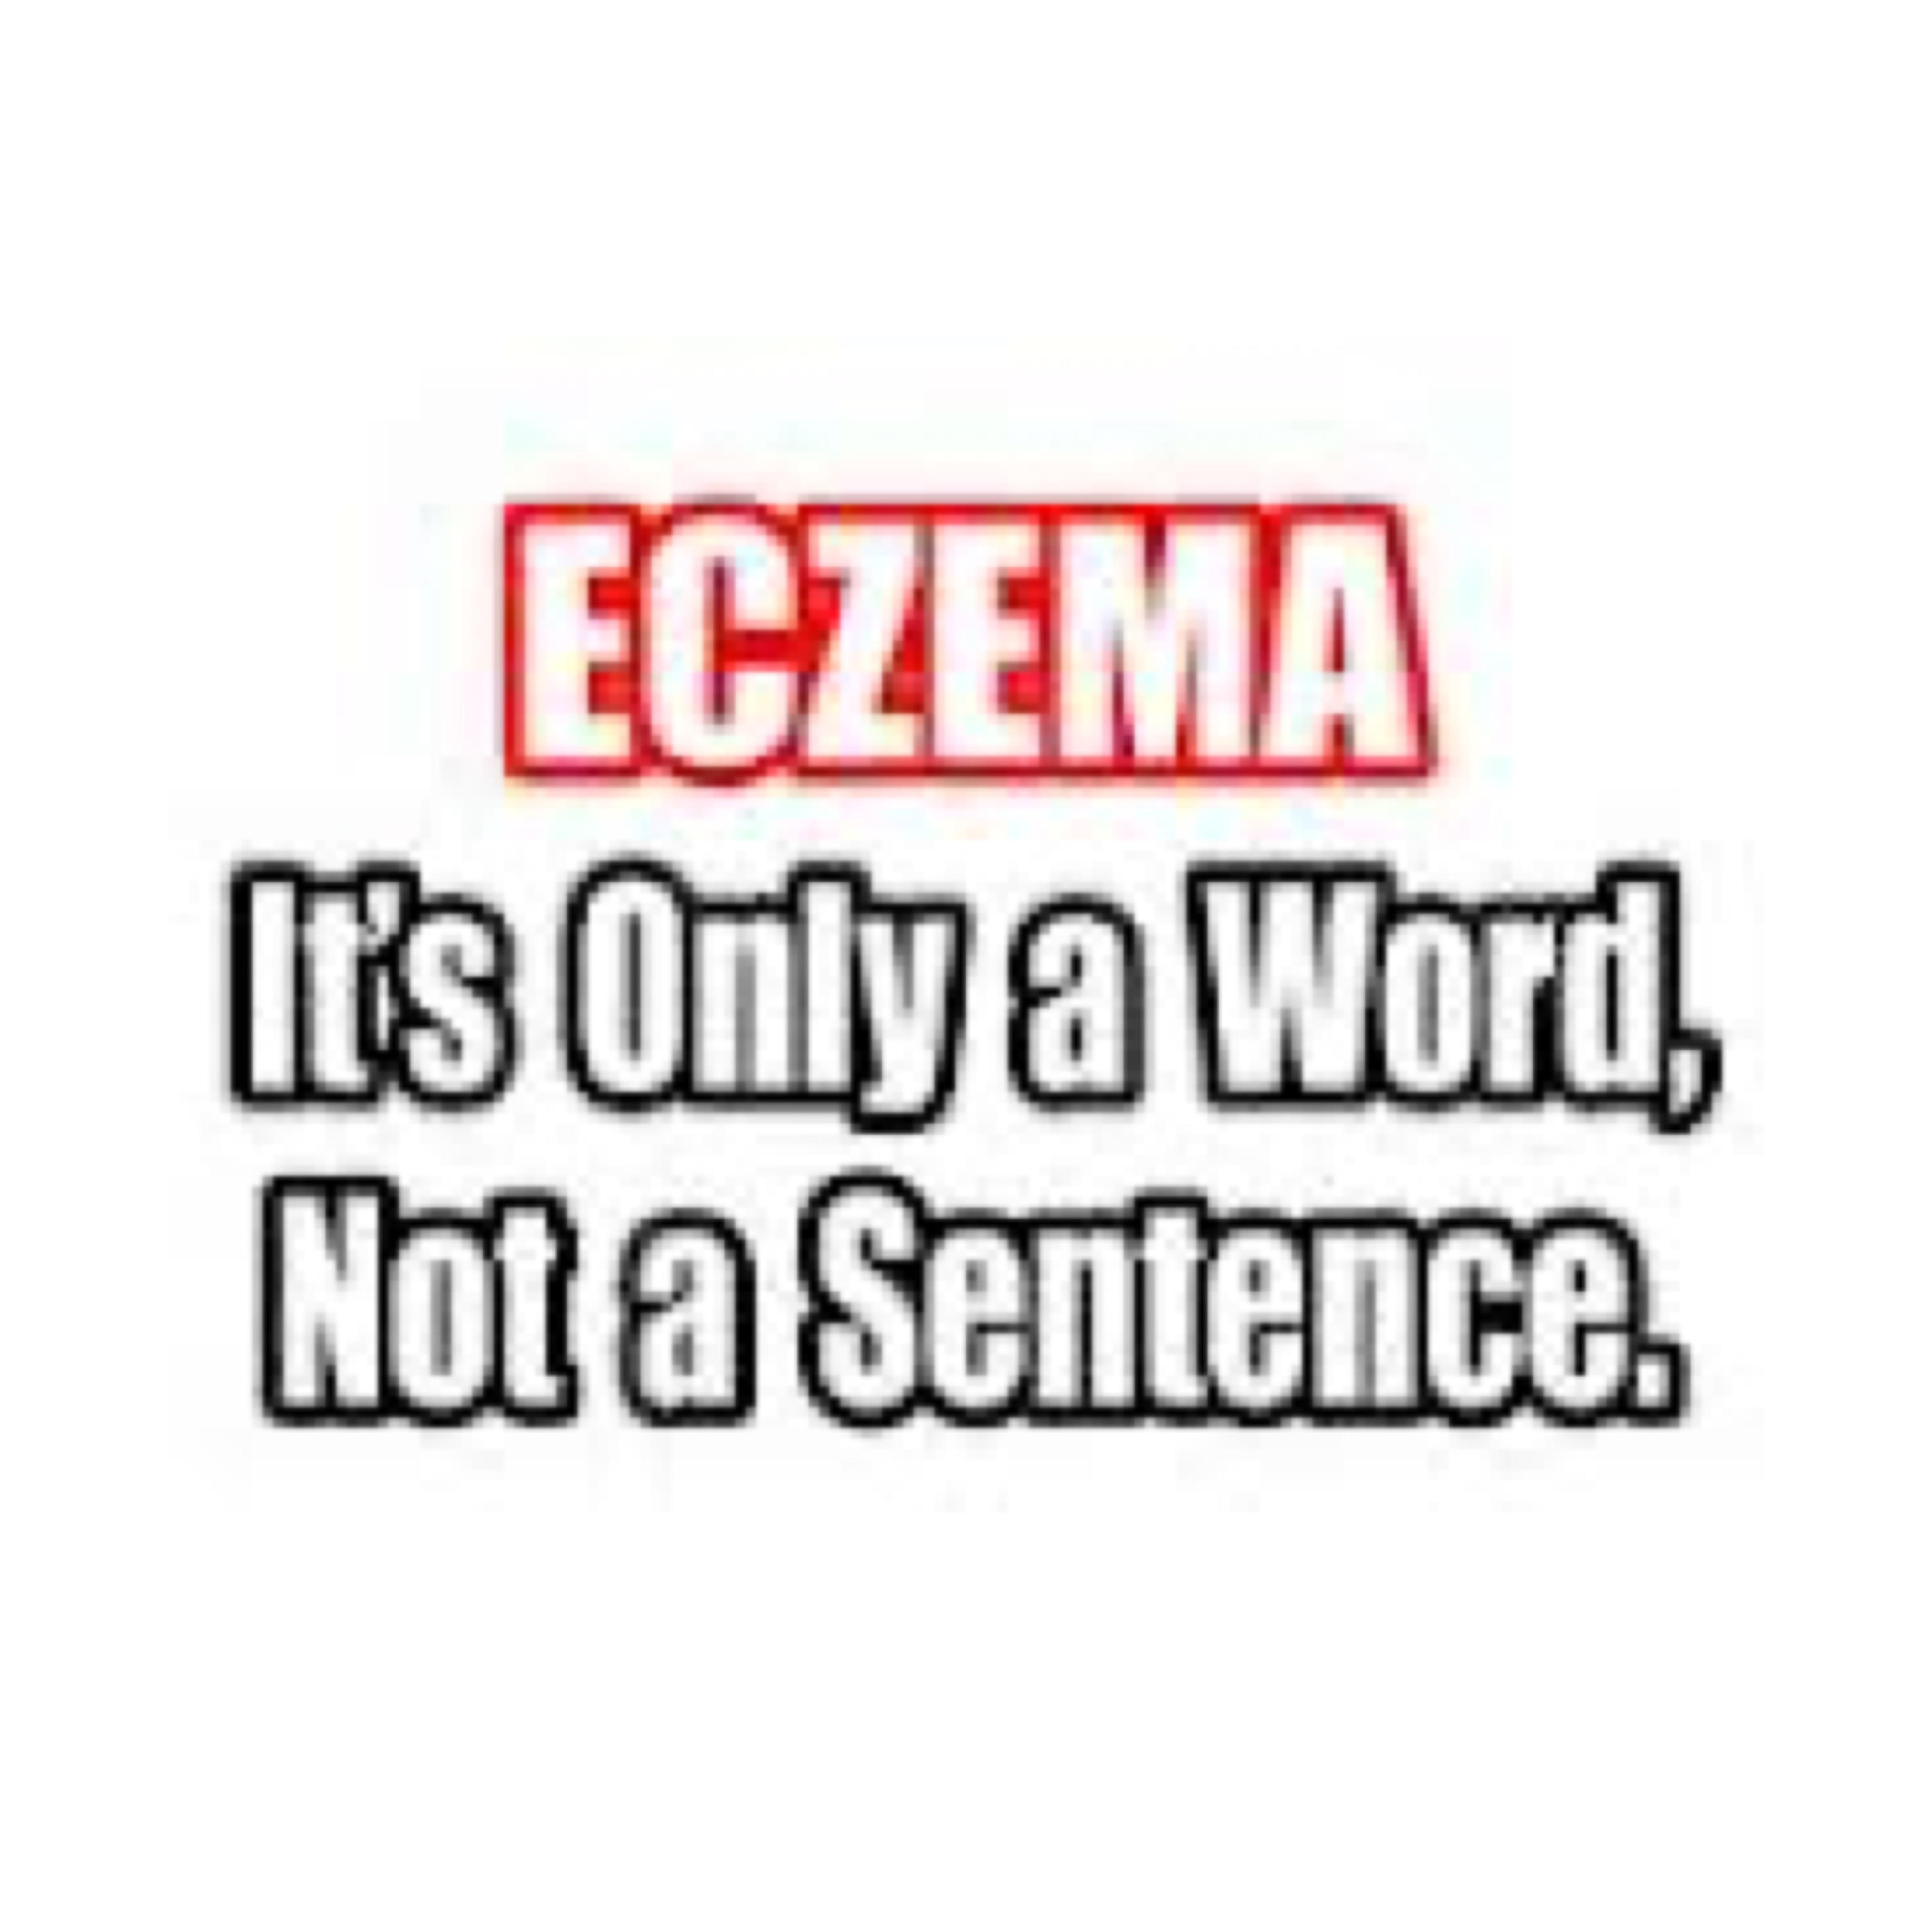 blog image - eczema poster